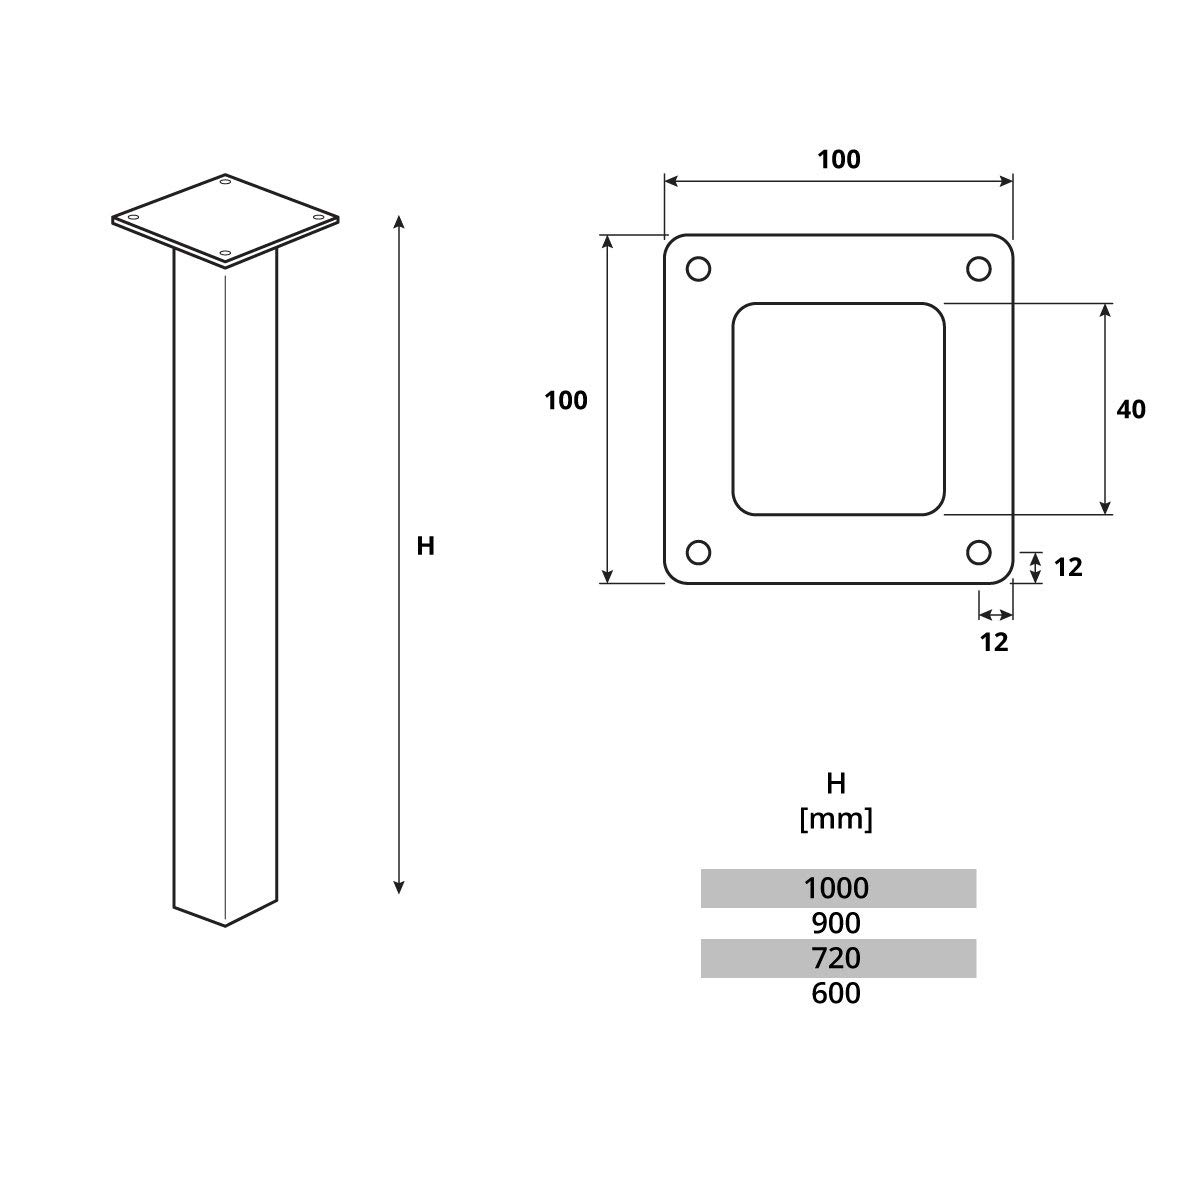 Perfil Cuadrado 80x80 mm 1 Piezas Negro Intenso HOLZBRINK Pata de la Mesa de Acero HLT-14A-J-100-9005 Altura: 100 cm